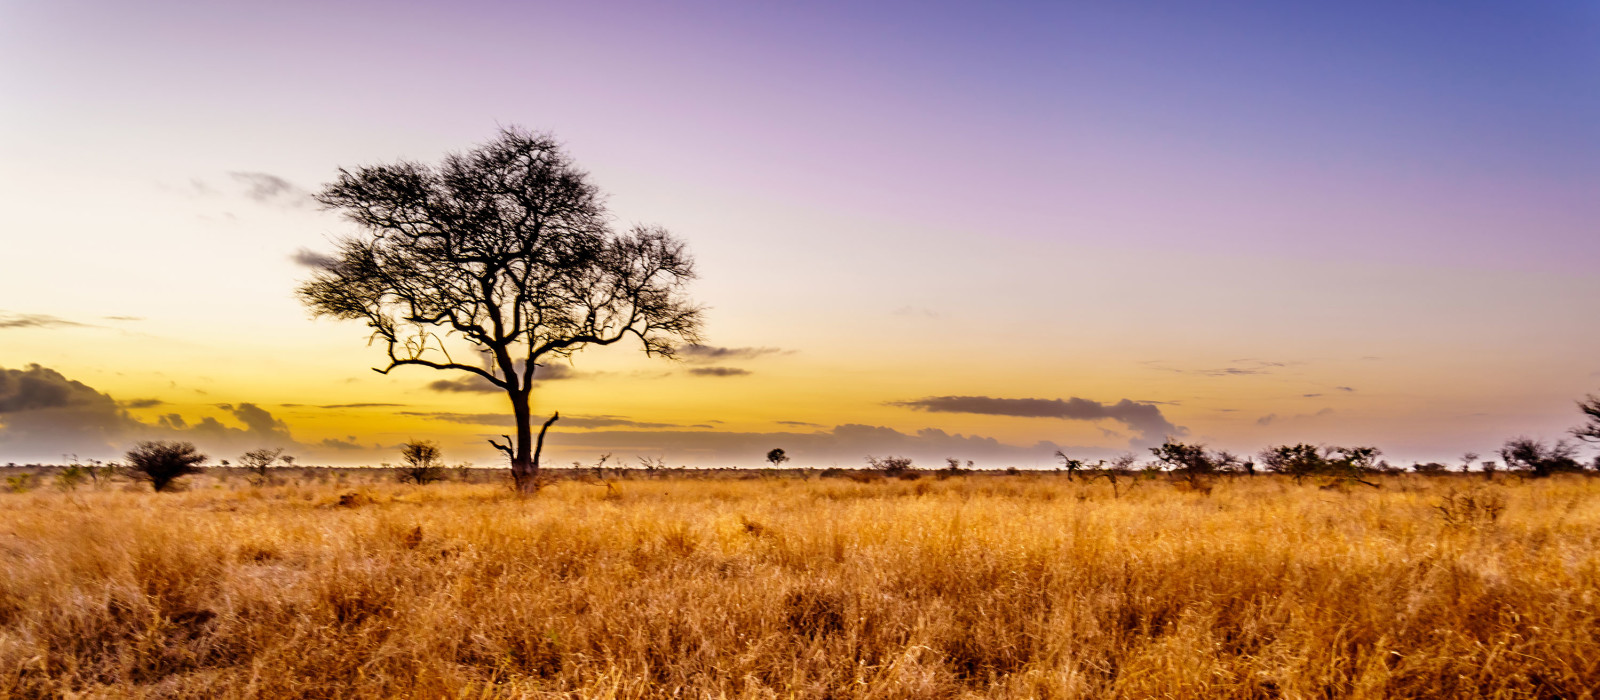 Reiseziel Zentrale Krüger-Region Südafrika